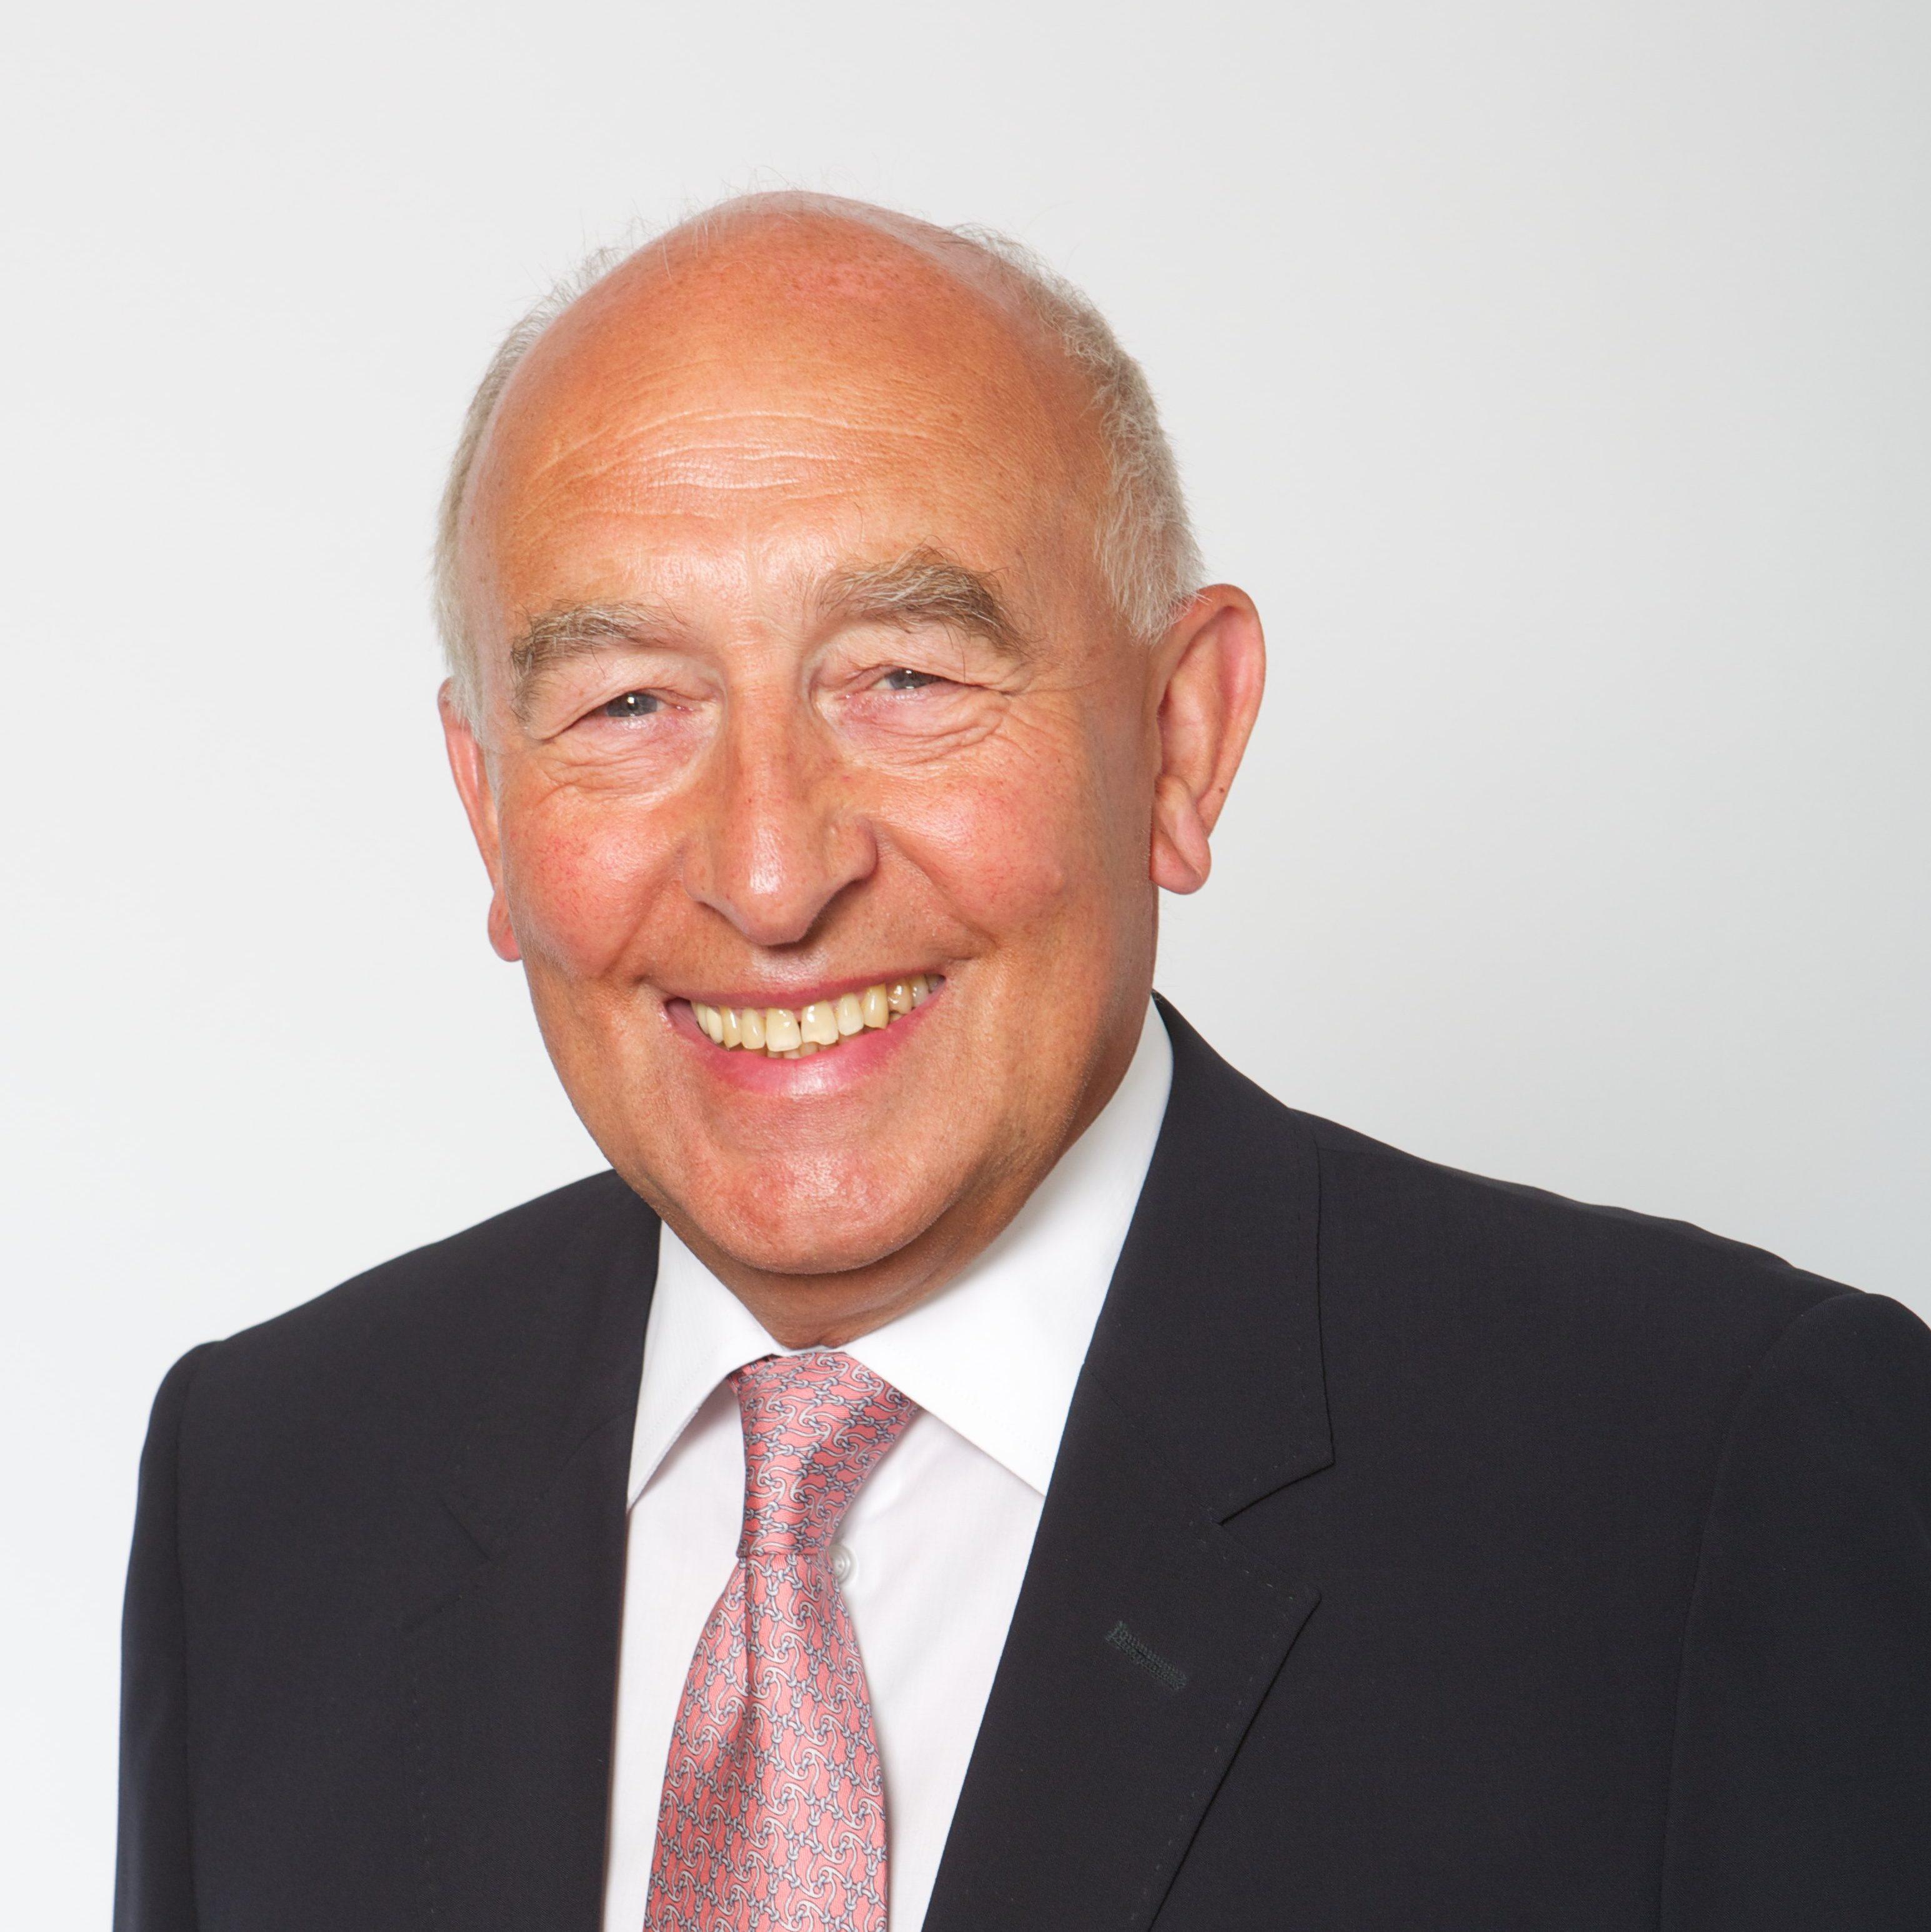 Maurice Watkins CBE, Chairman